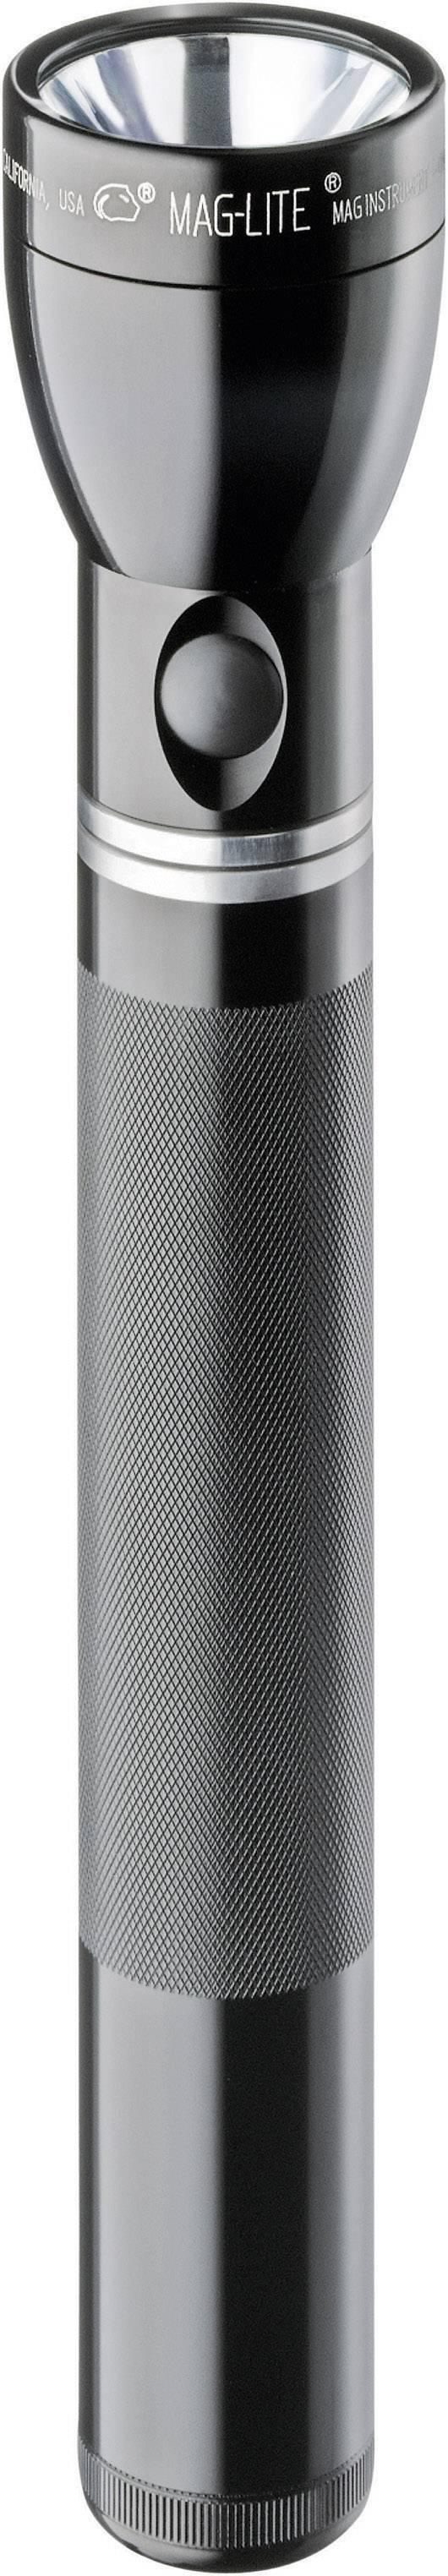 Vreckové halogénové svietidlo Mag-Lite RE4019, 230 V/50 Hz, 12 V/DC